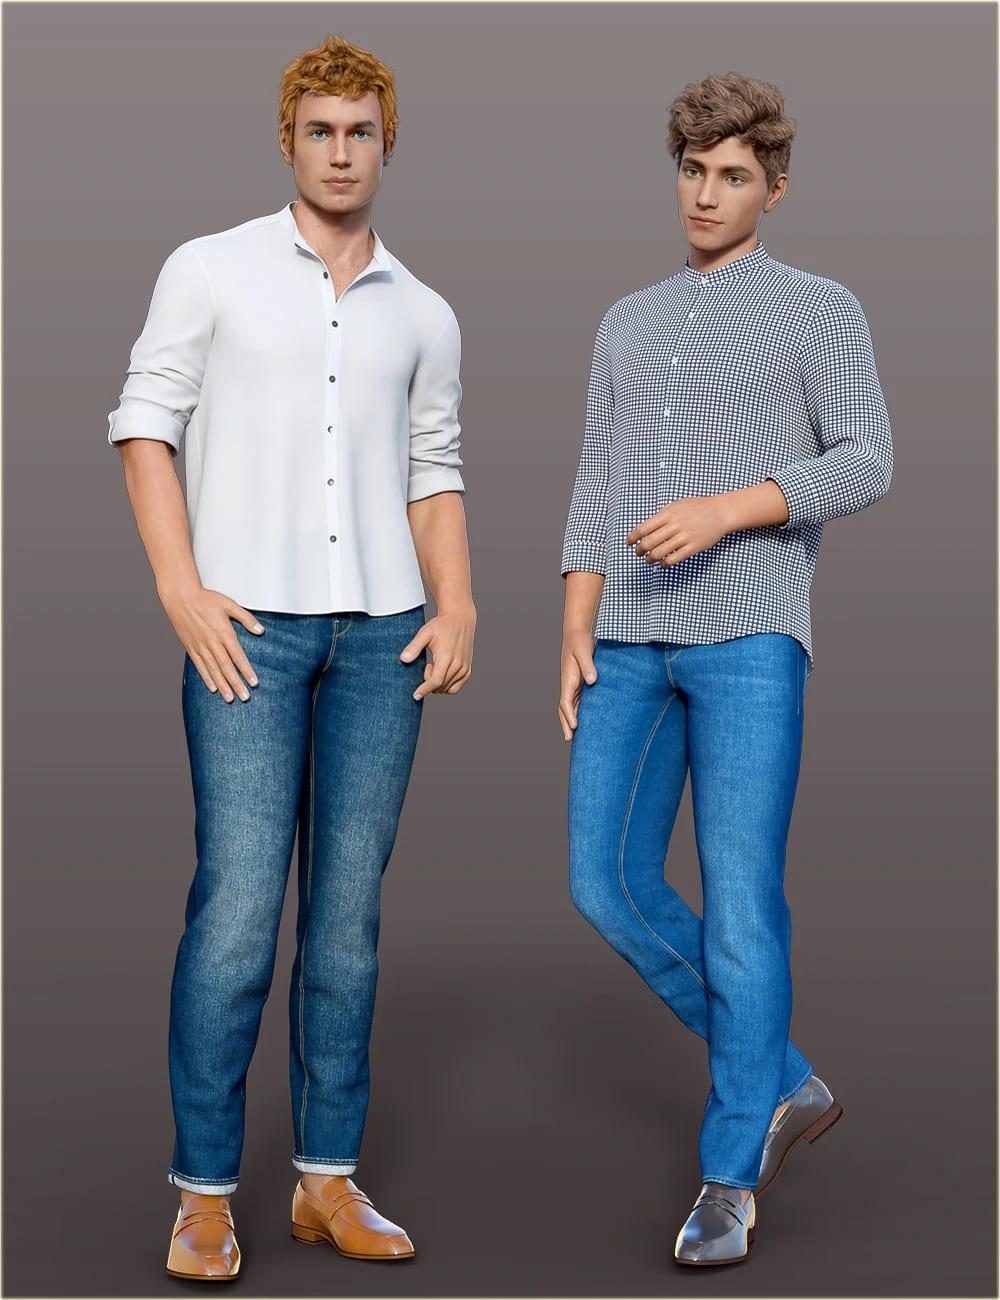 dForce H&C Mandarin Collar Shirt Outfit for Genesis 8 Male(s)_DAZ3D下载站